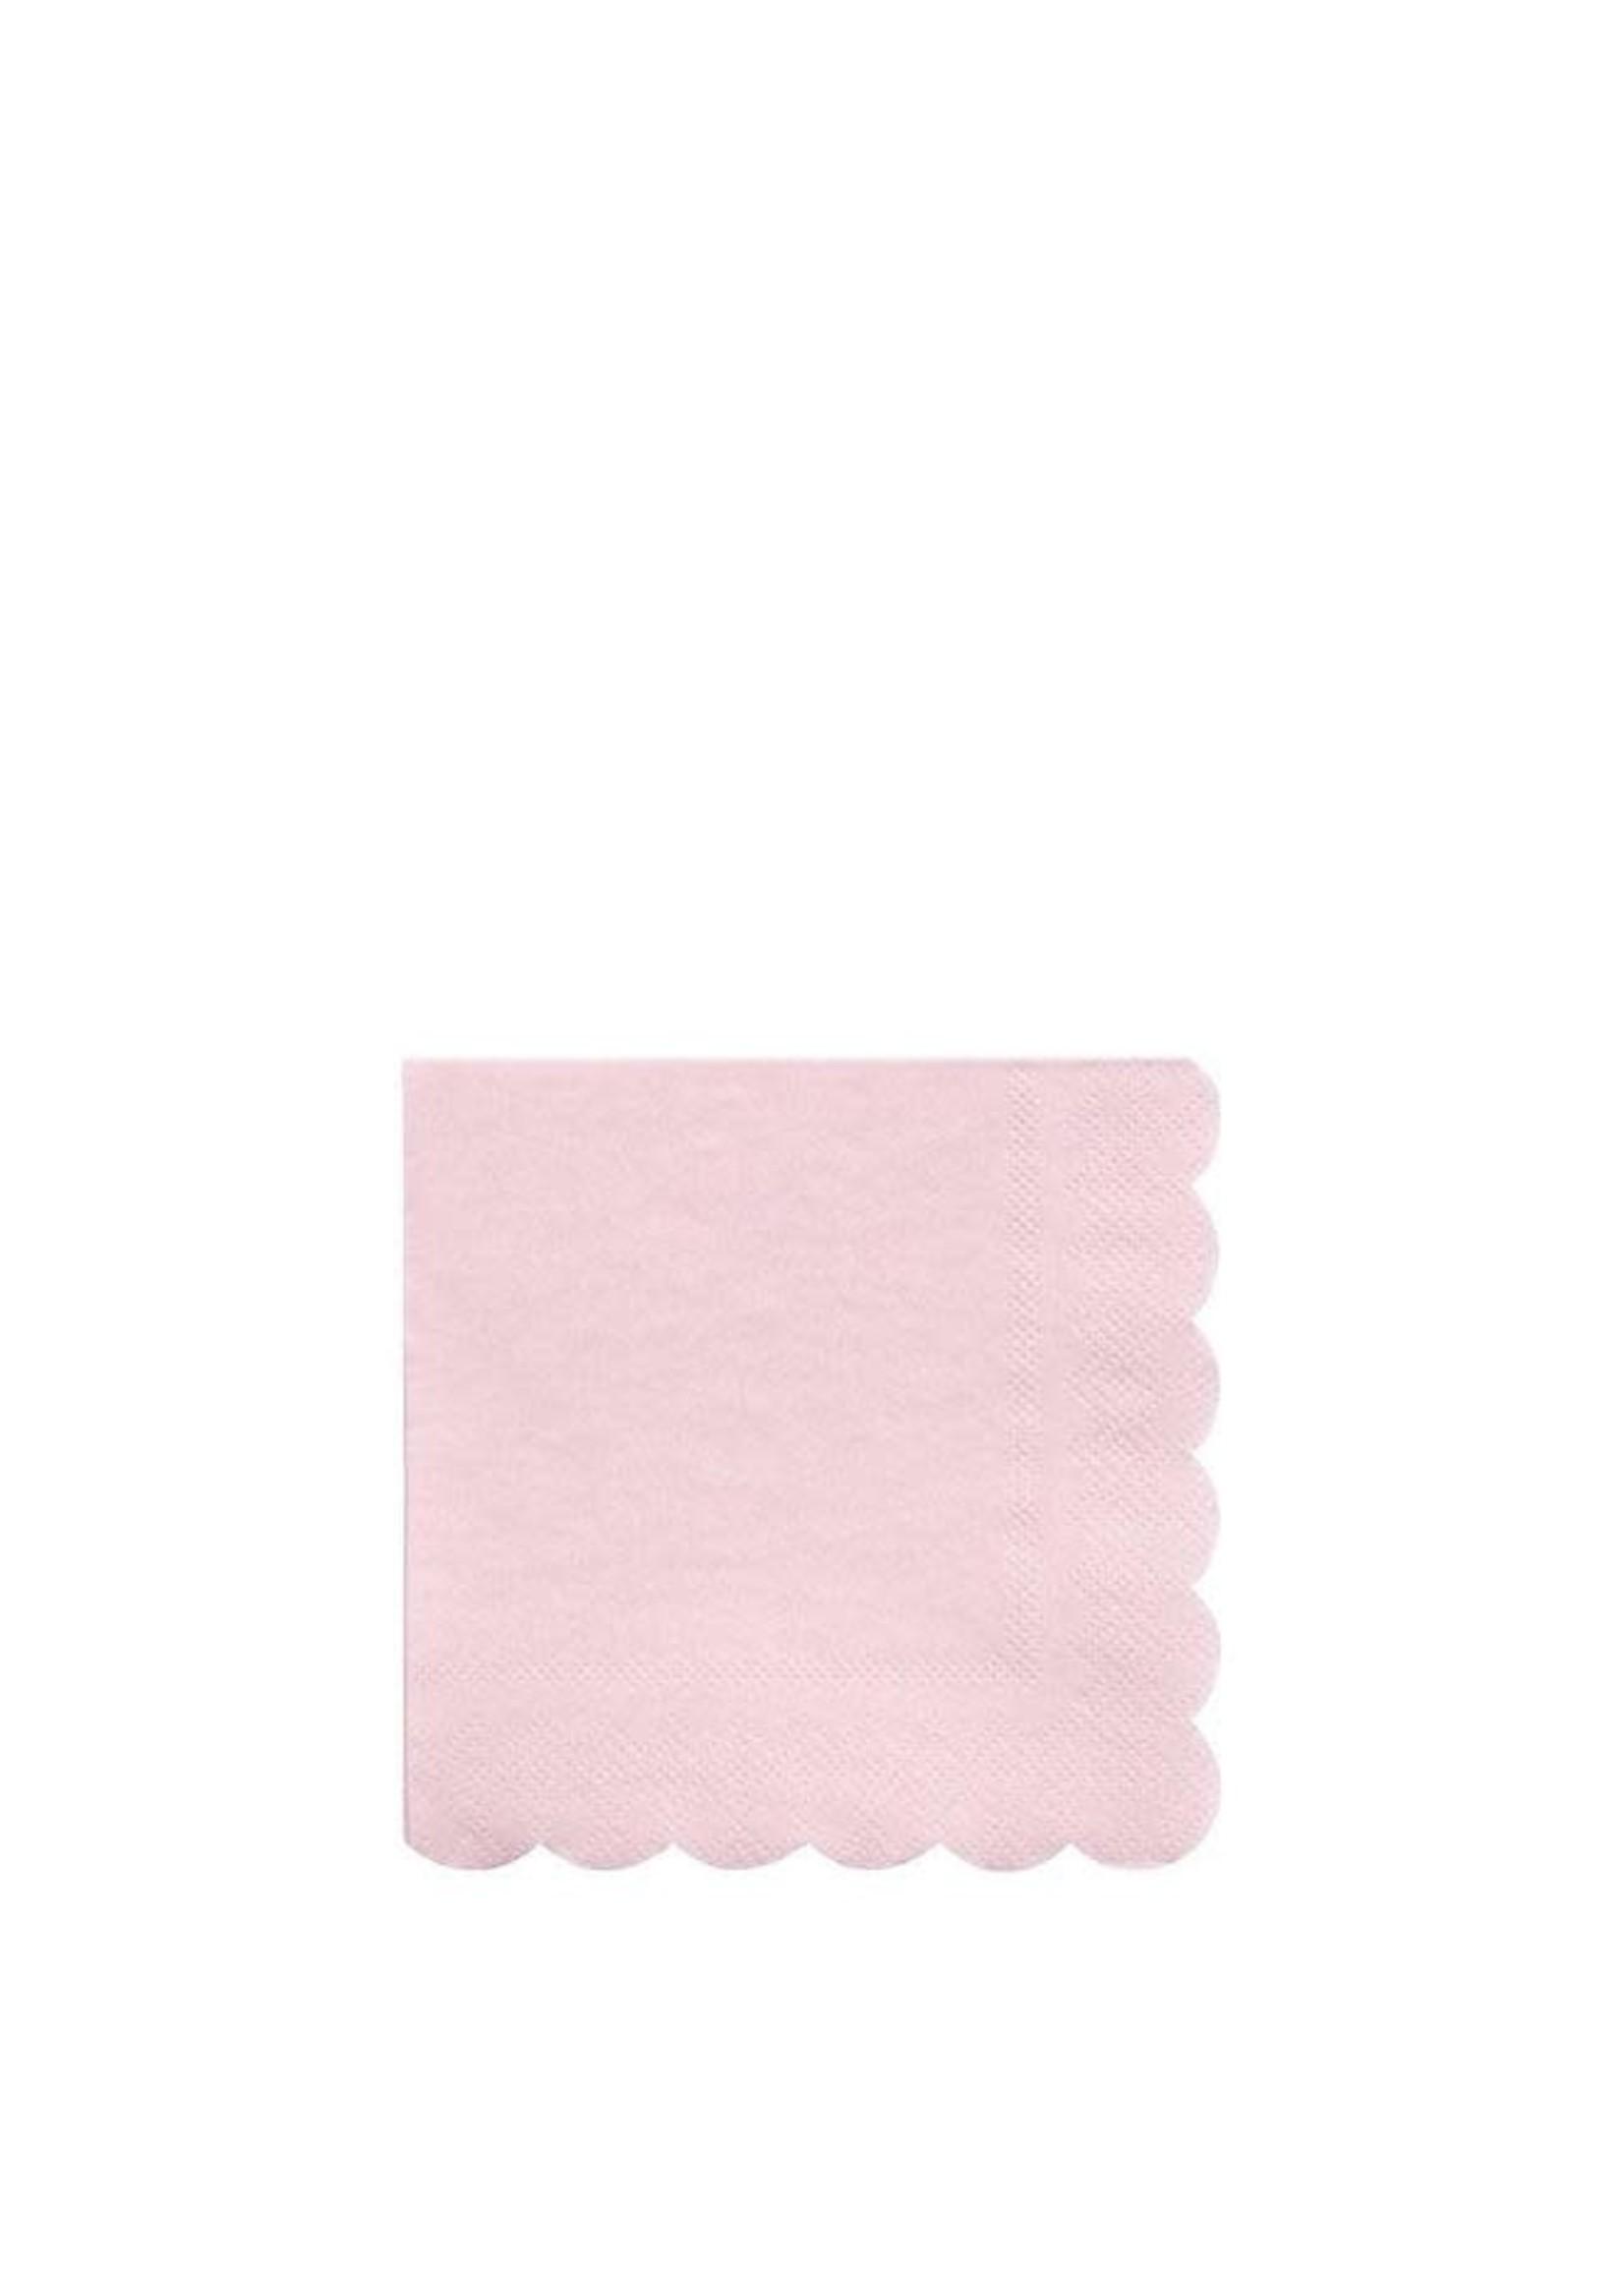 Meri Meri Paper Napkin - Pale Pink Small